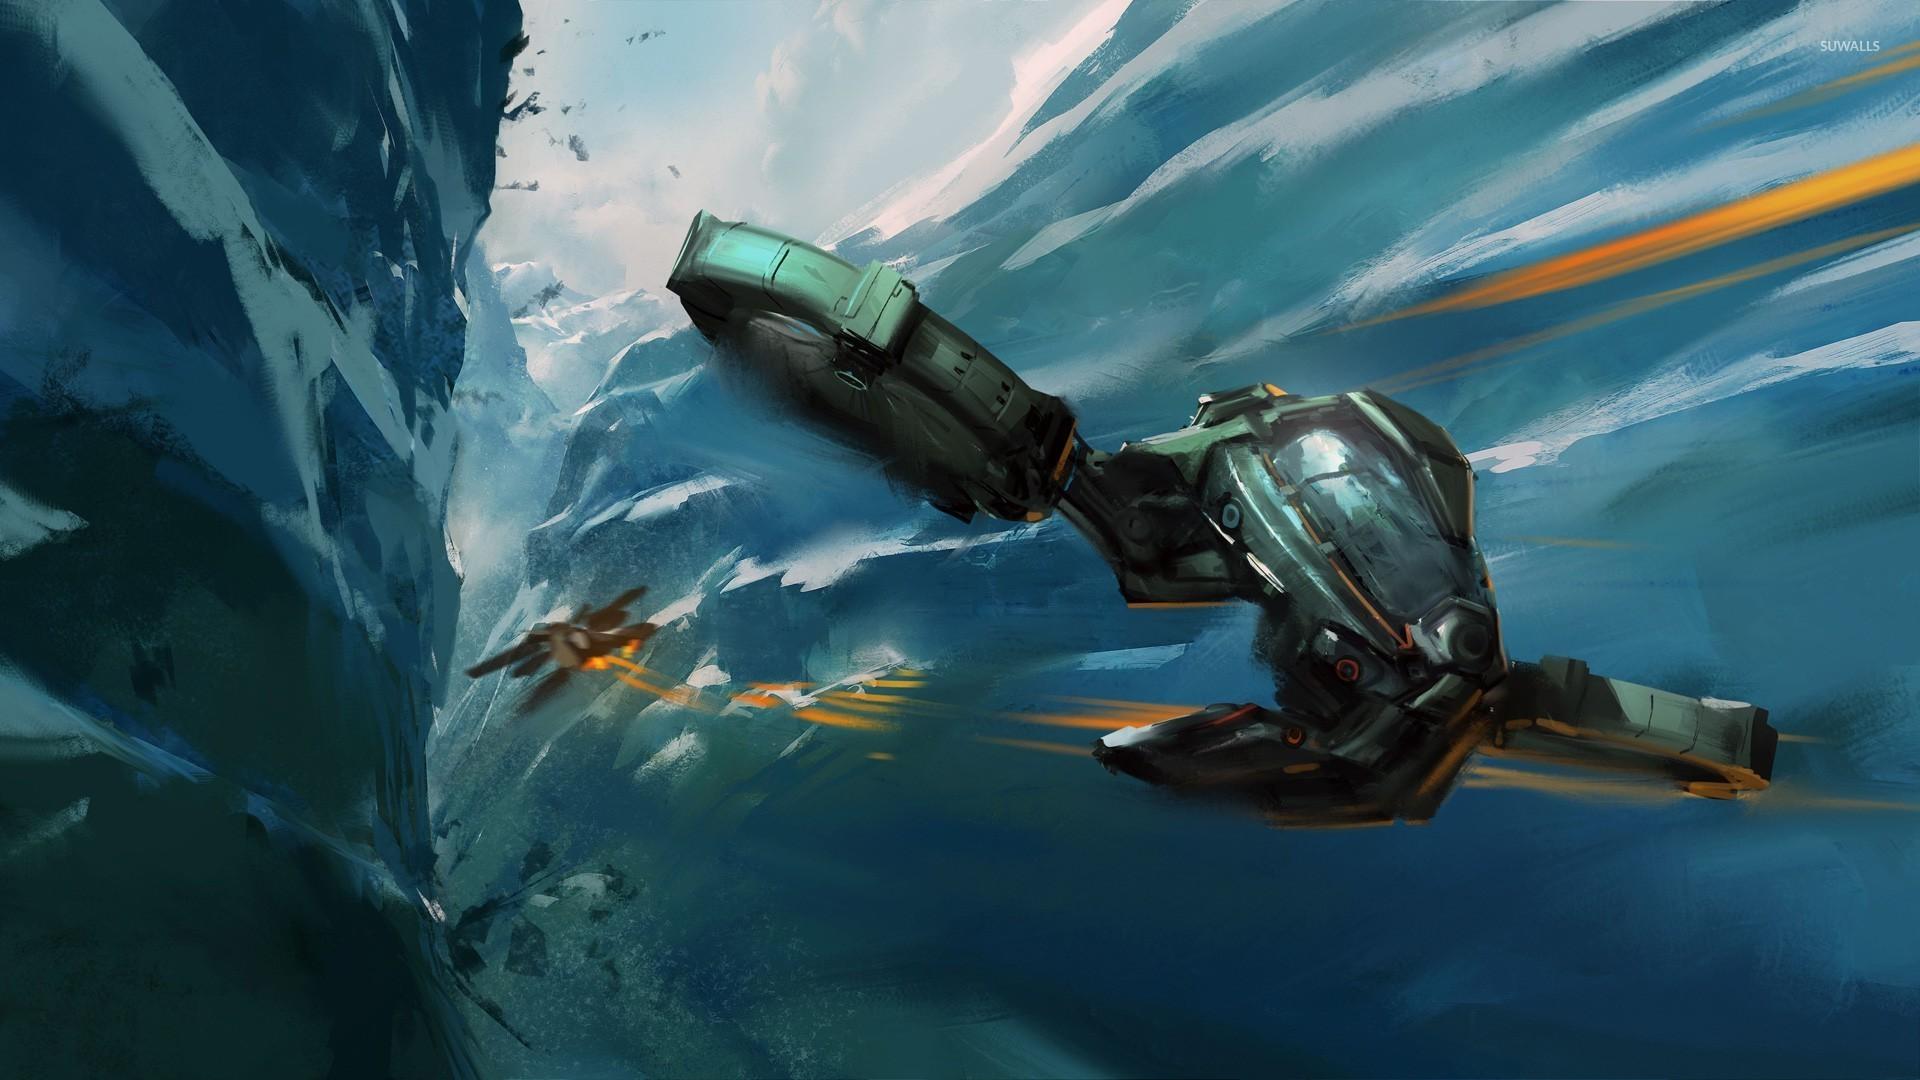 [Flashback] On Stranger Tides [Hawkman] Spaceship-battle-25248-1920x1080